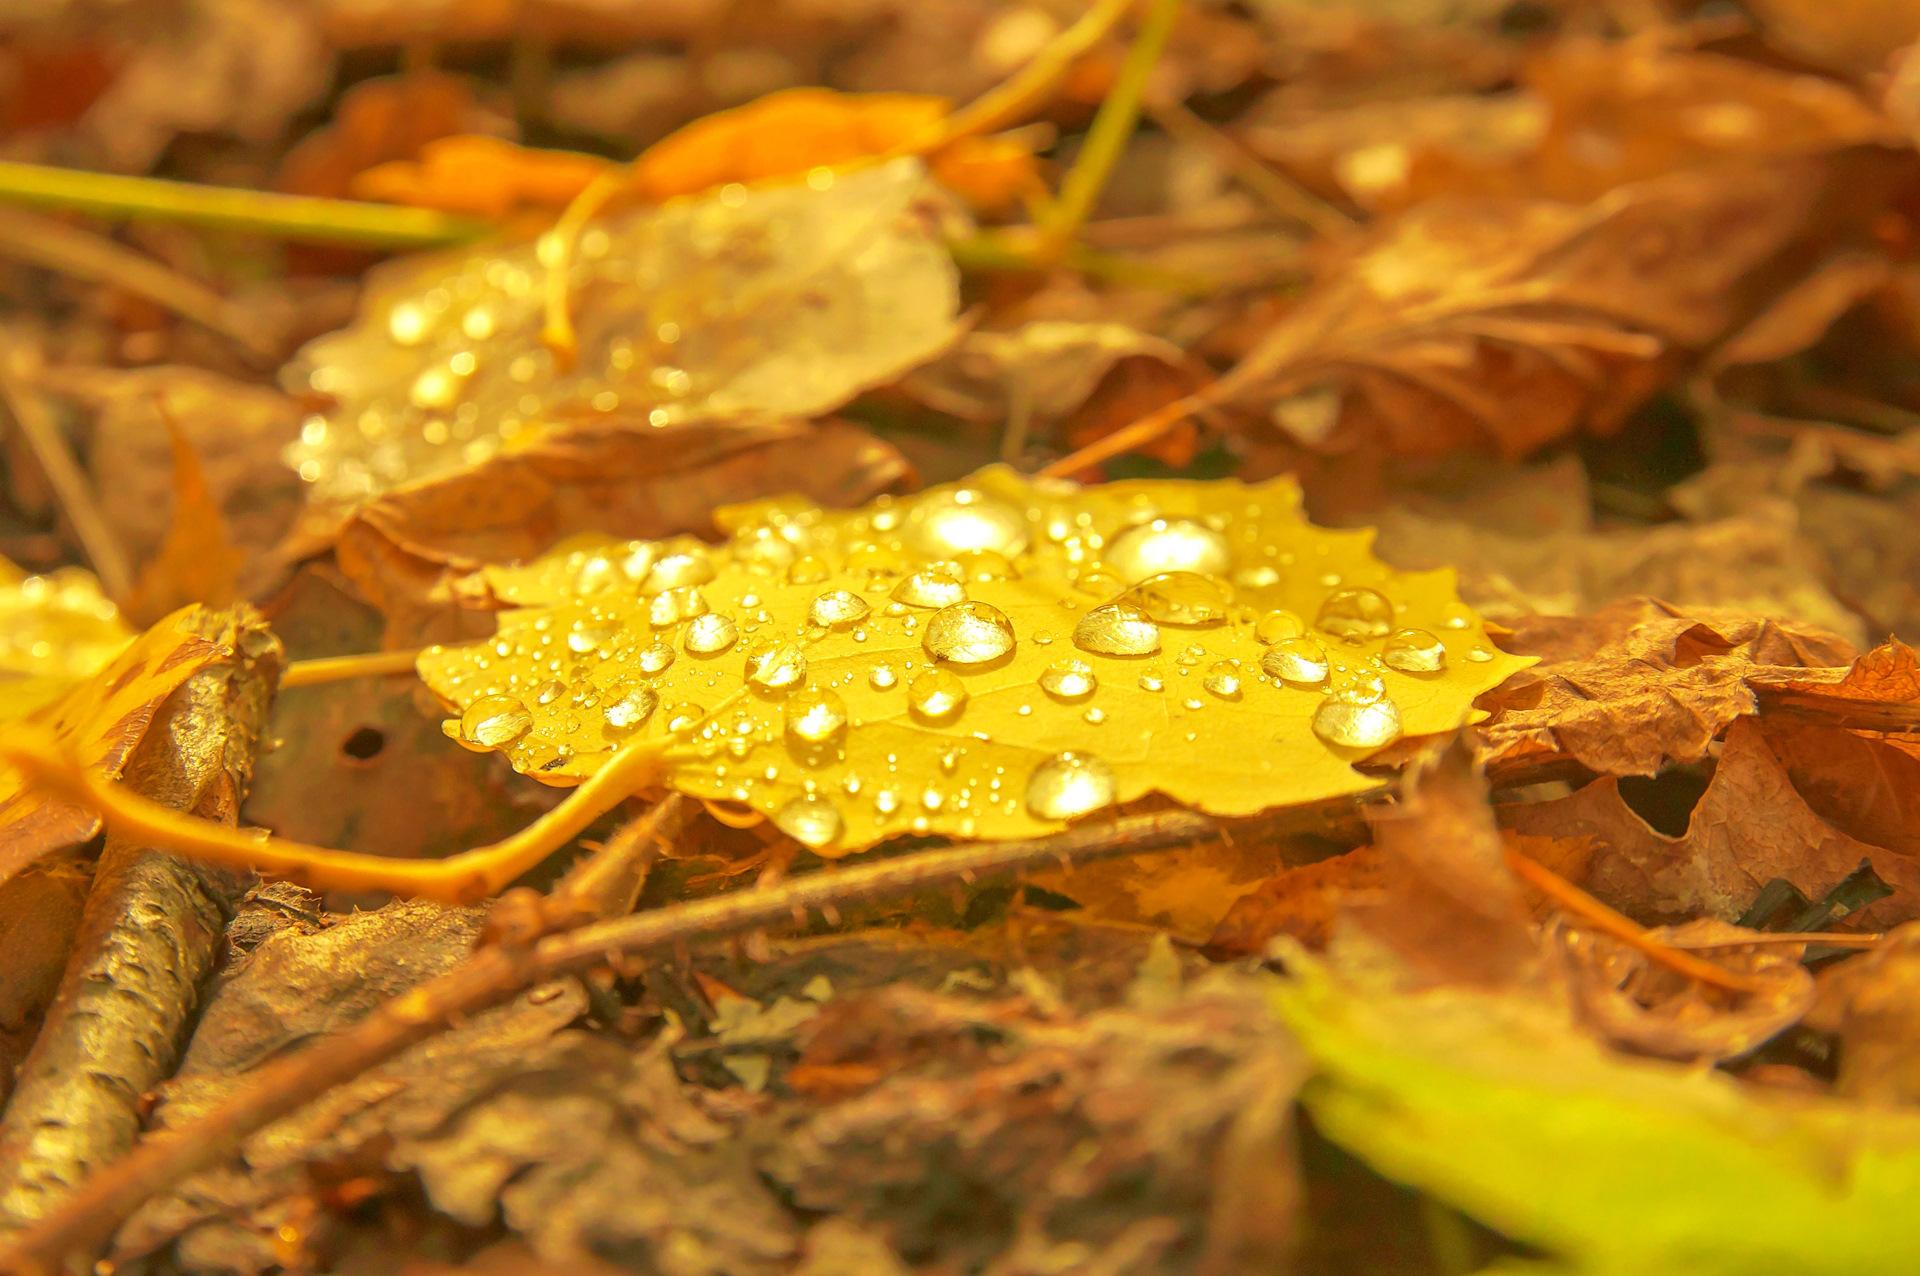 фотокто осенняя роса застряла мойке, зять